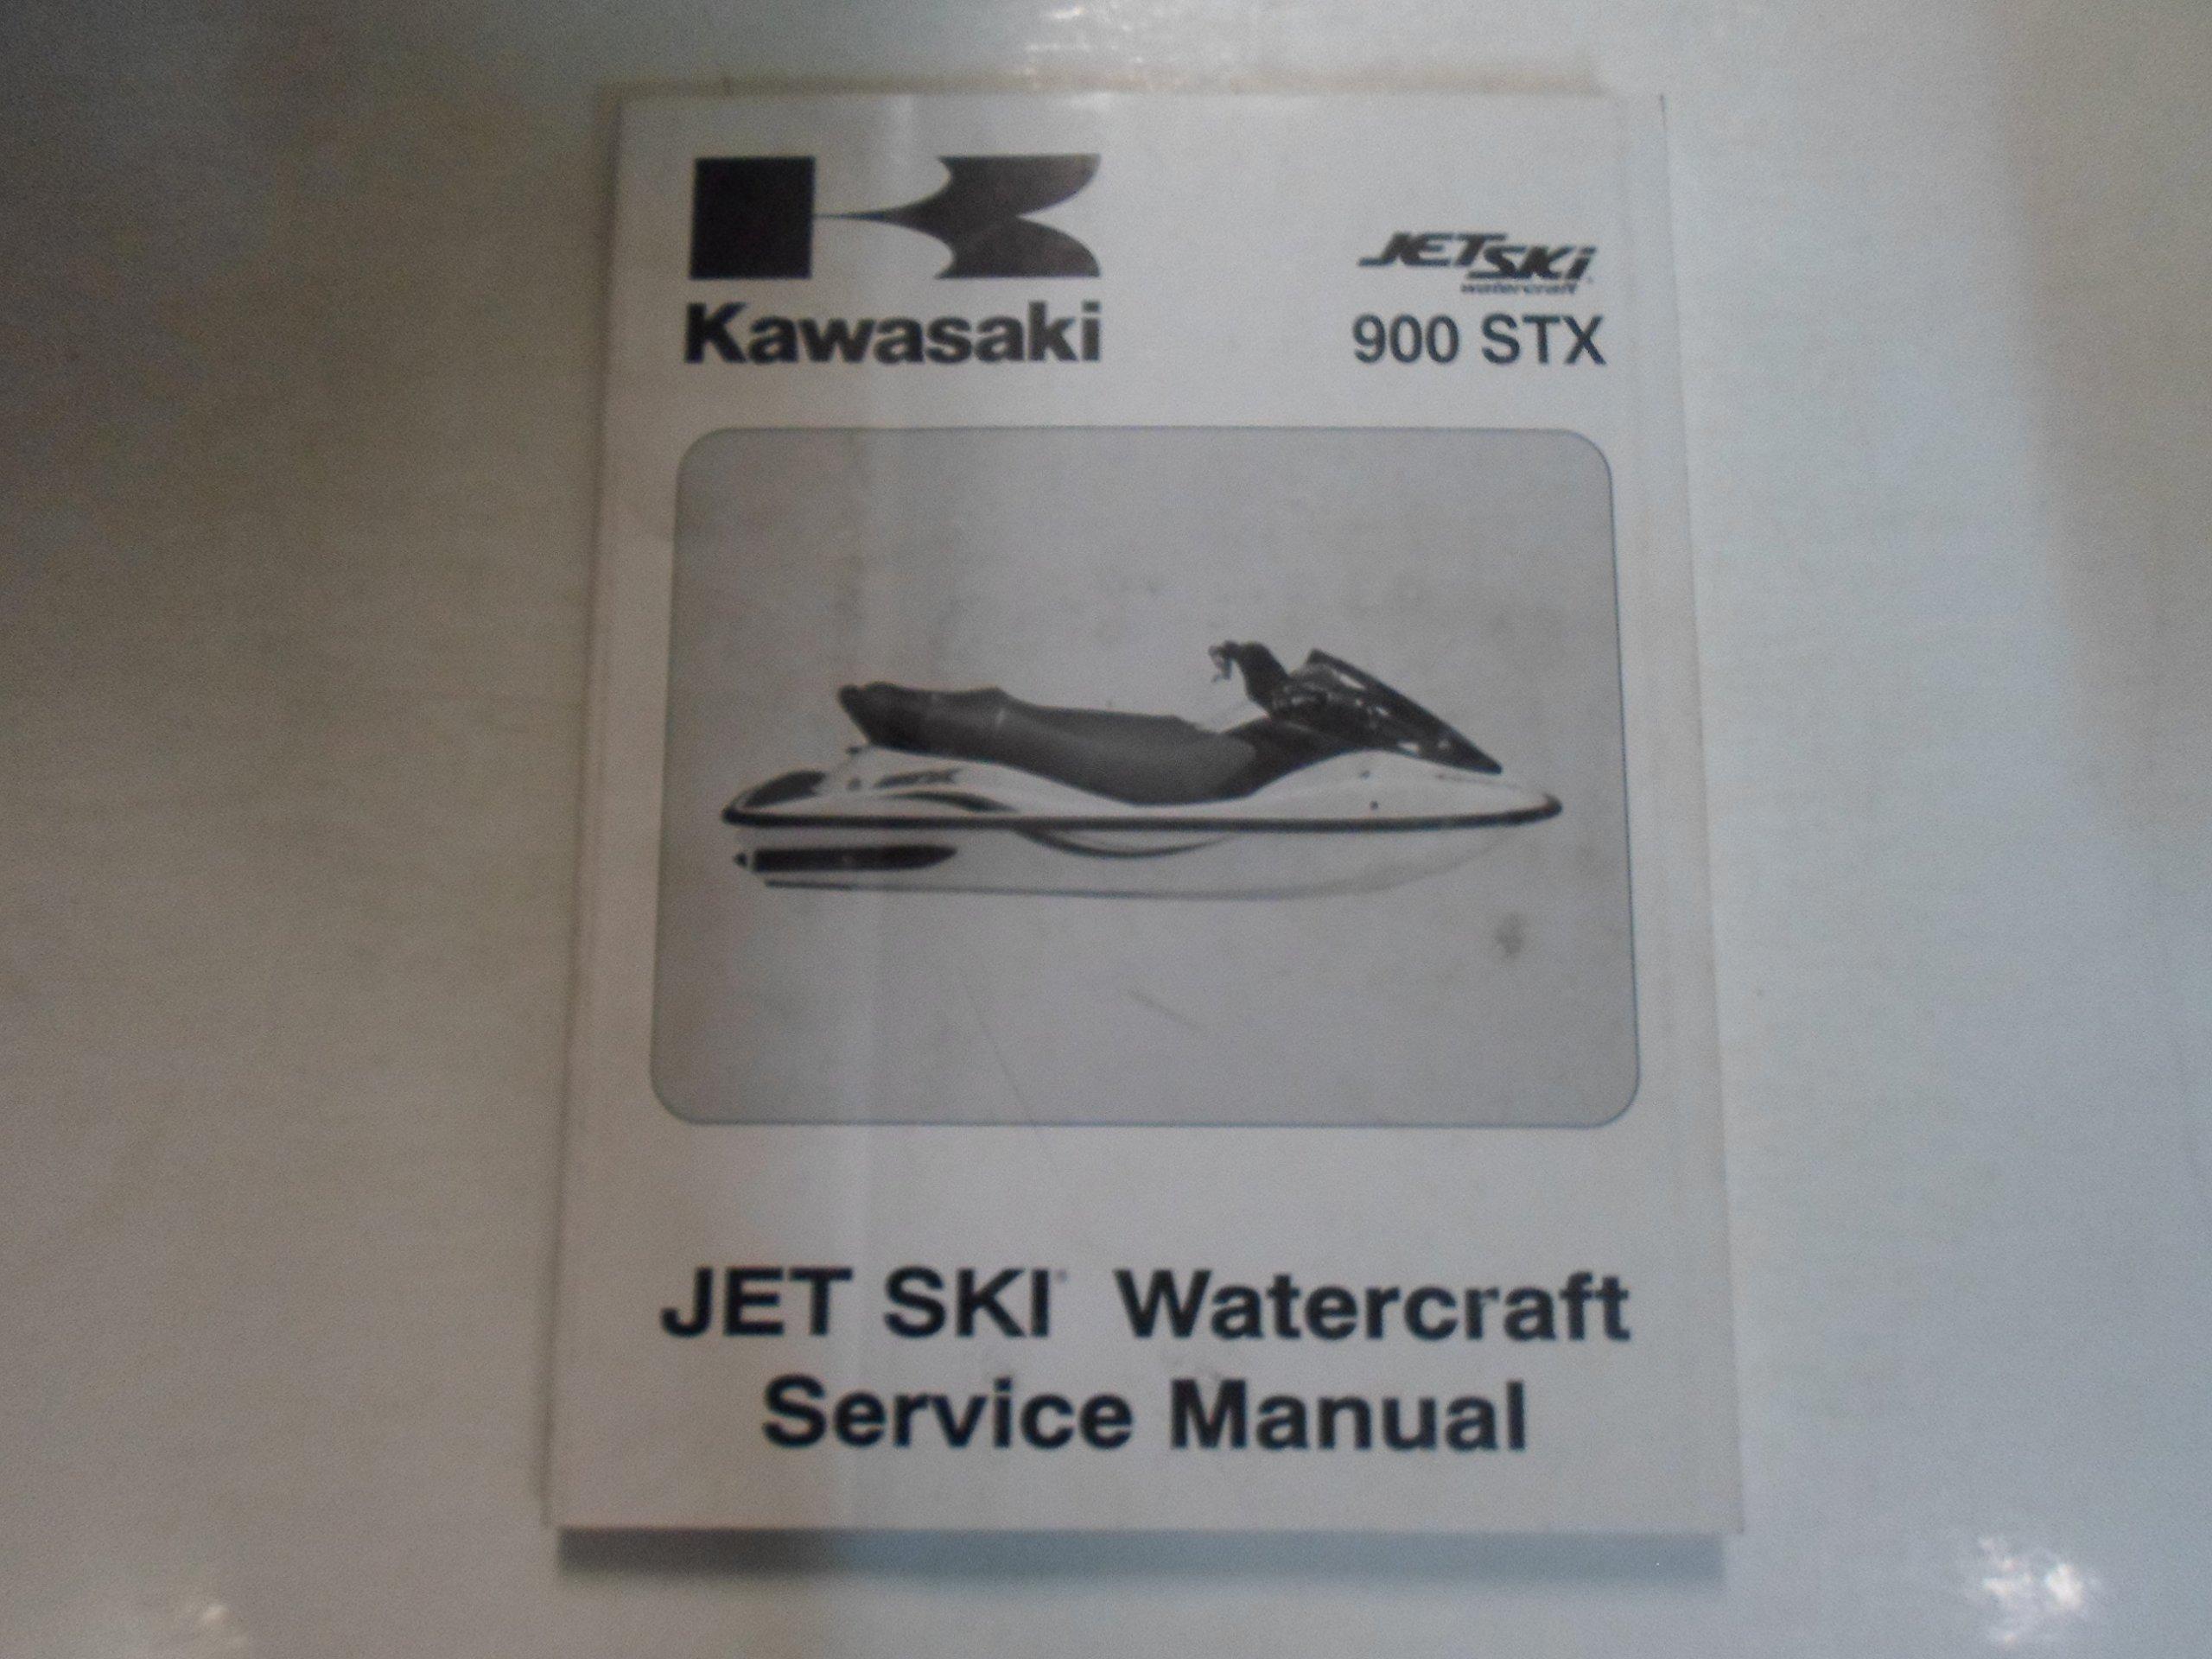 2003 Kawasaki 900 STX Jet Ski Watercraft Service Repair Manual STAINED:  KAWASAKI: Amazon.com: Books